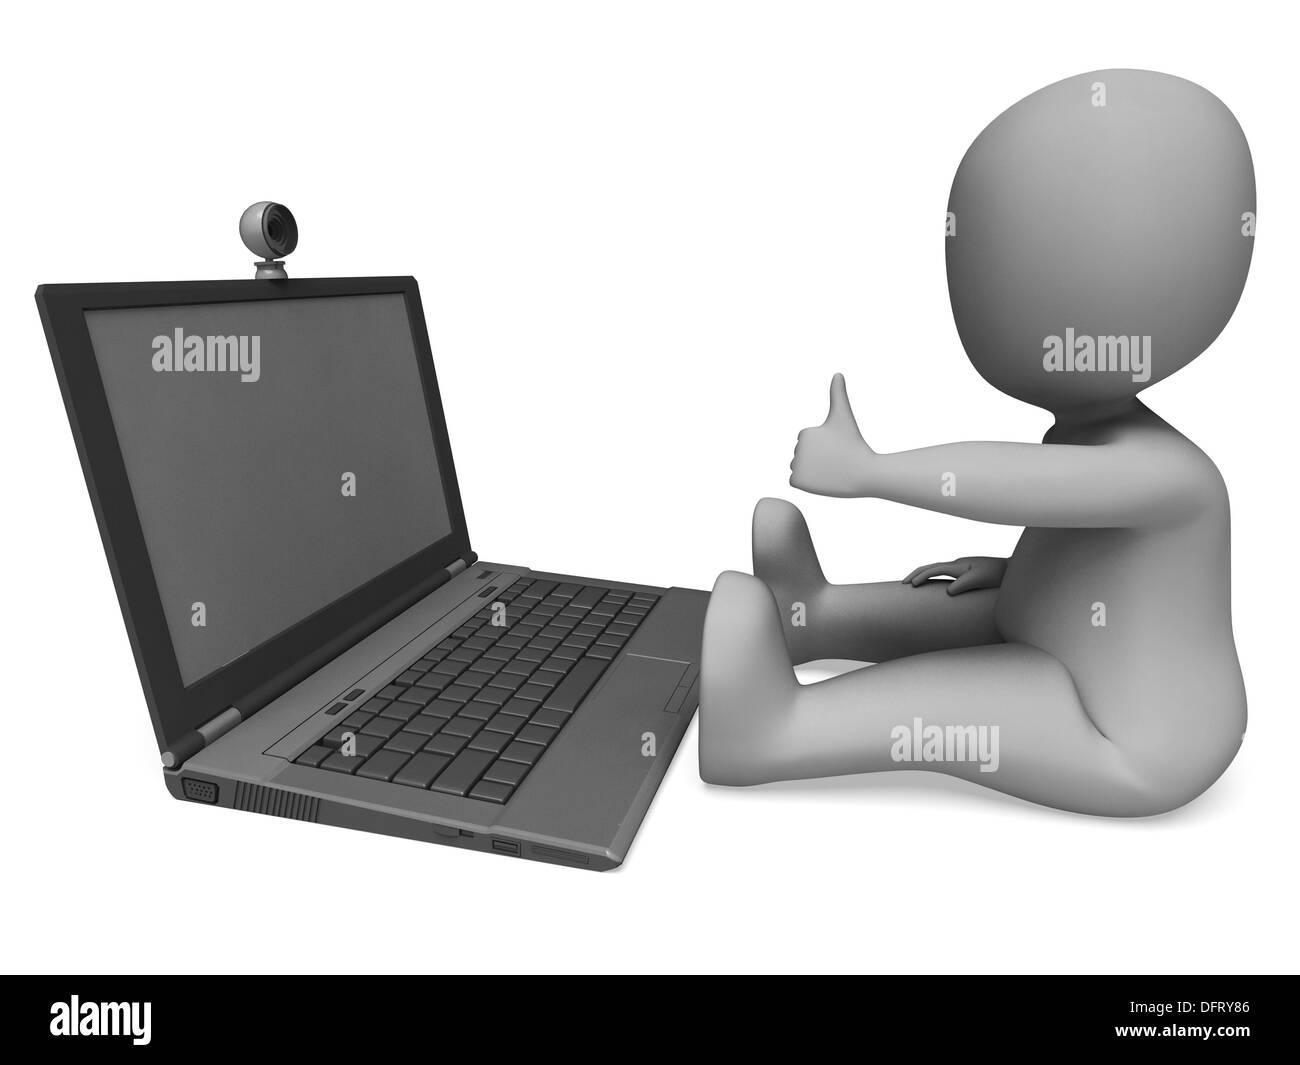 Online cam shows